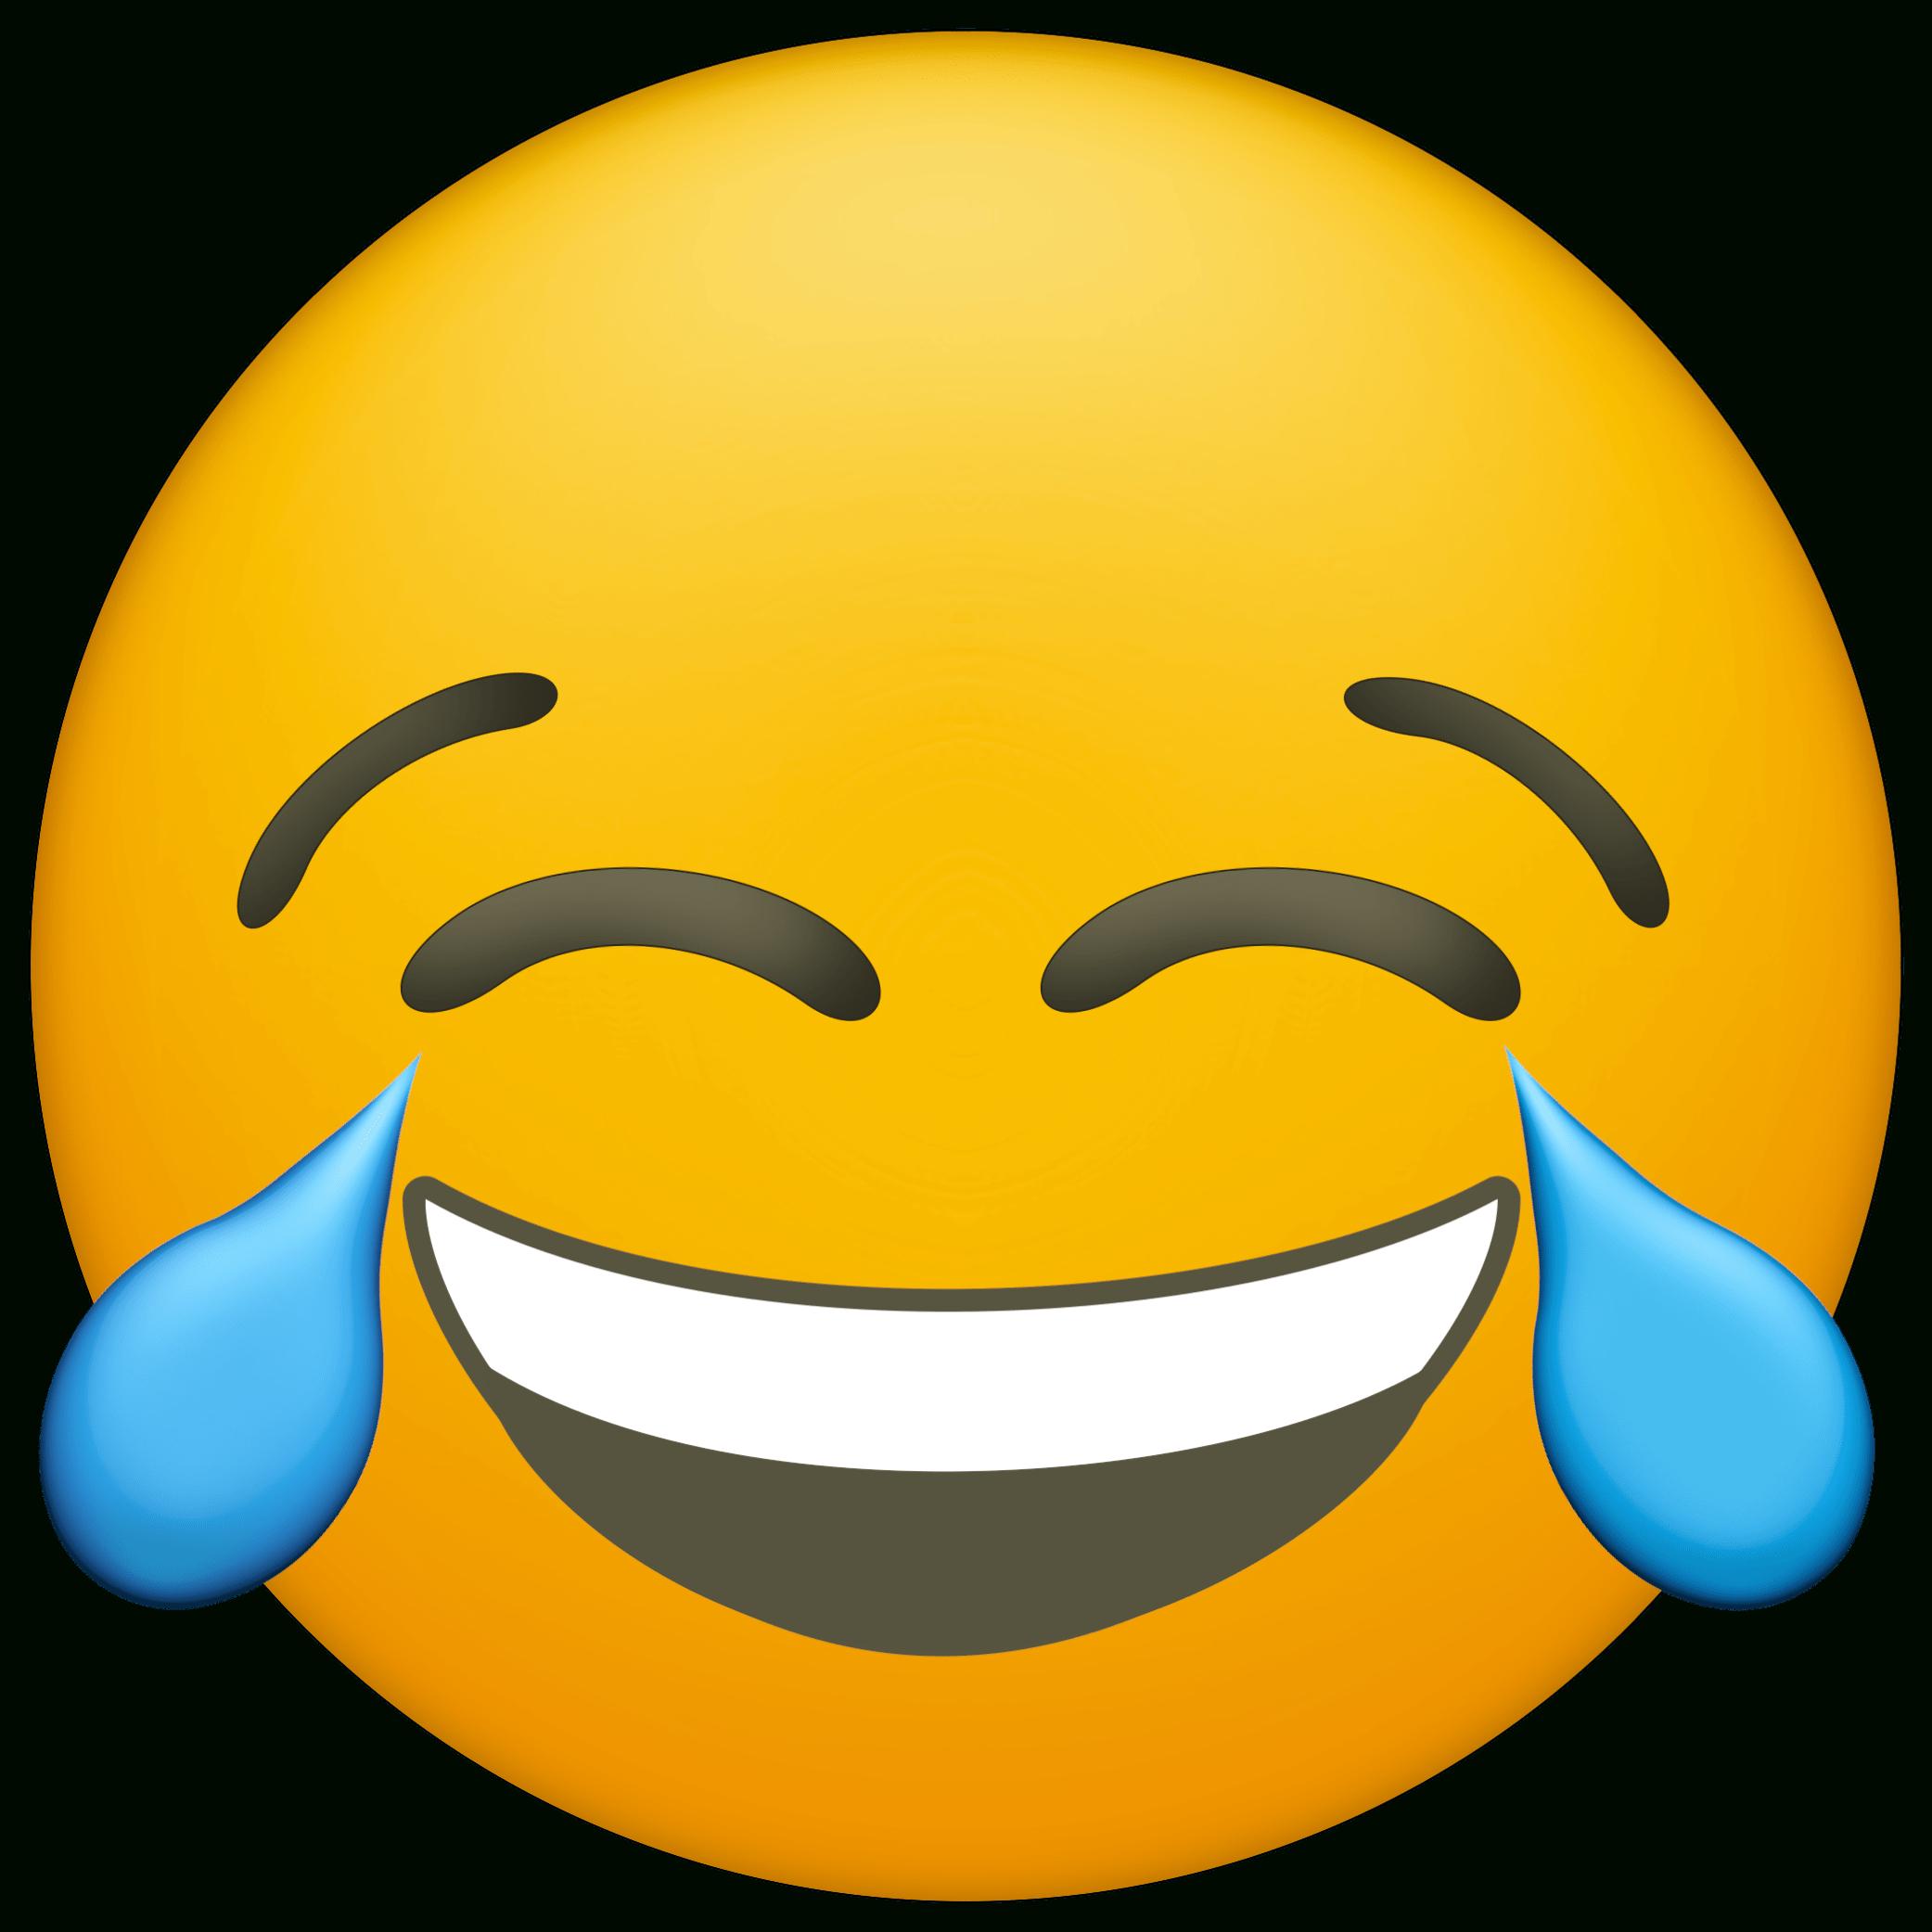 Emoji Faces Printable {Free Emoji Printables} - Paper Trail Design - Free Printable Emoji Faces